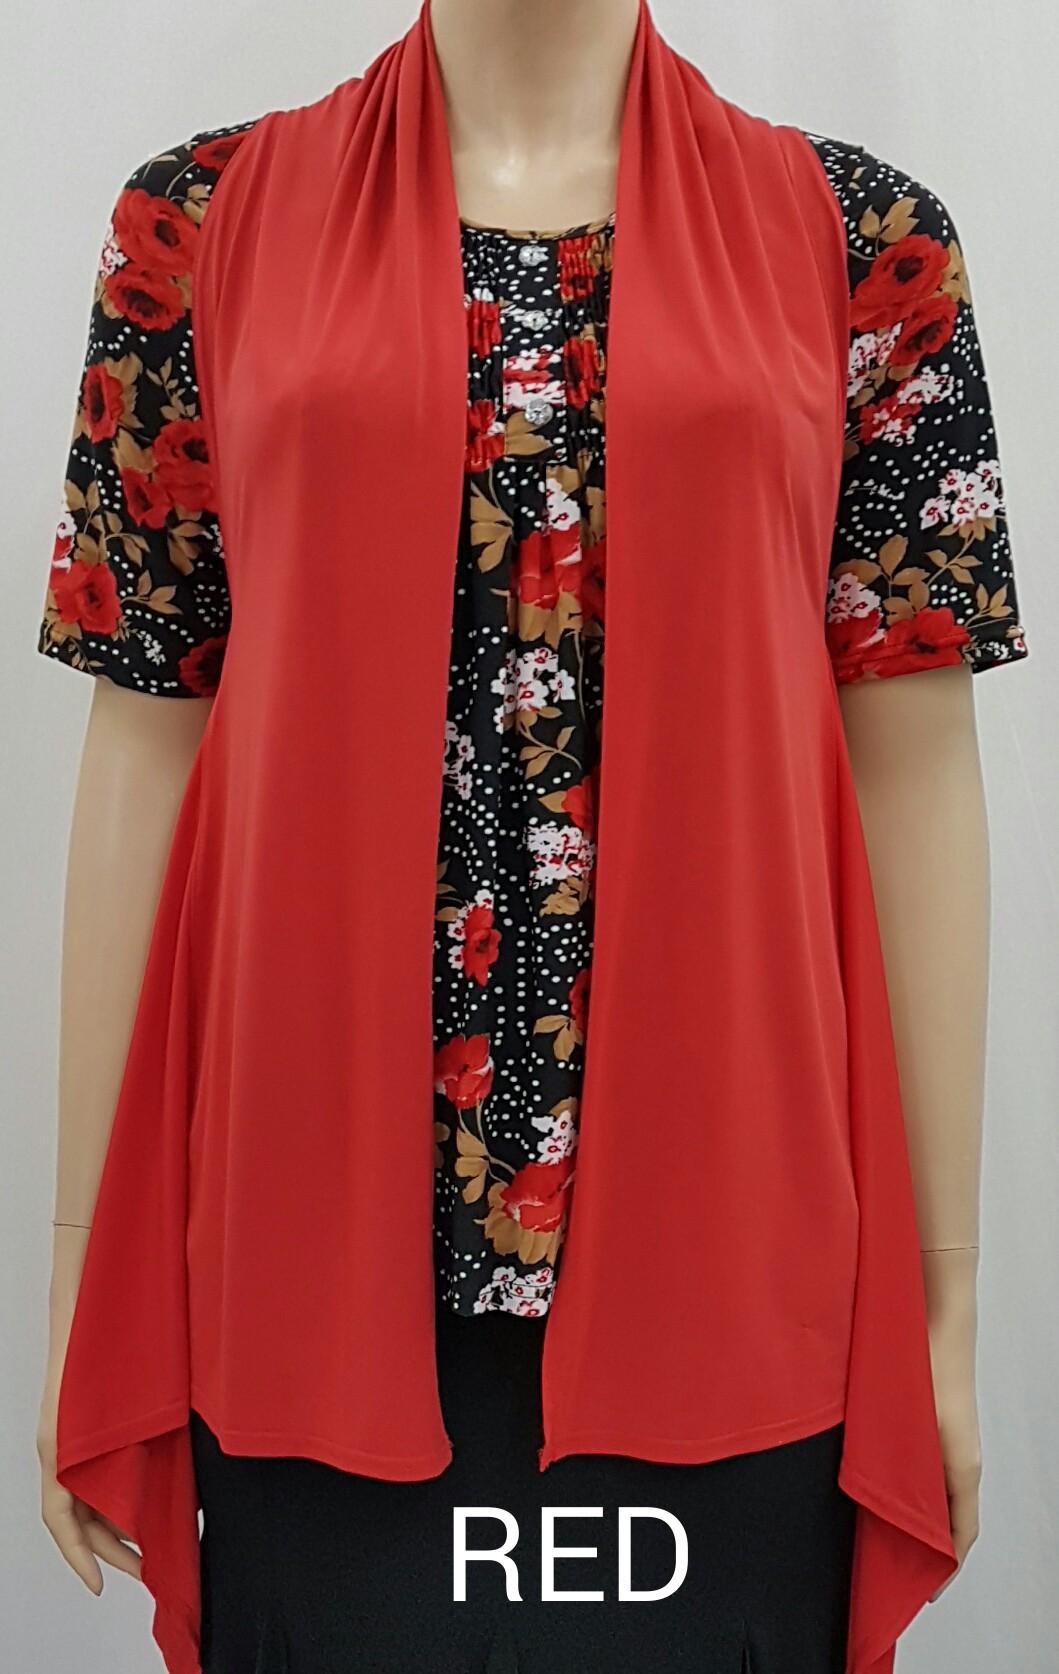 Ladies Vest 1232 [LV1232] - $15.00 : Girls dresses and ...